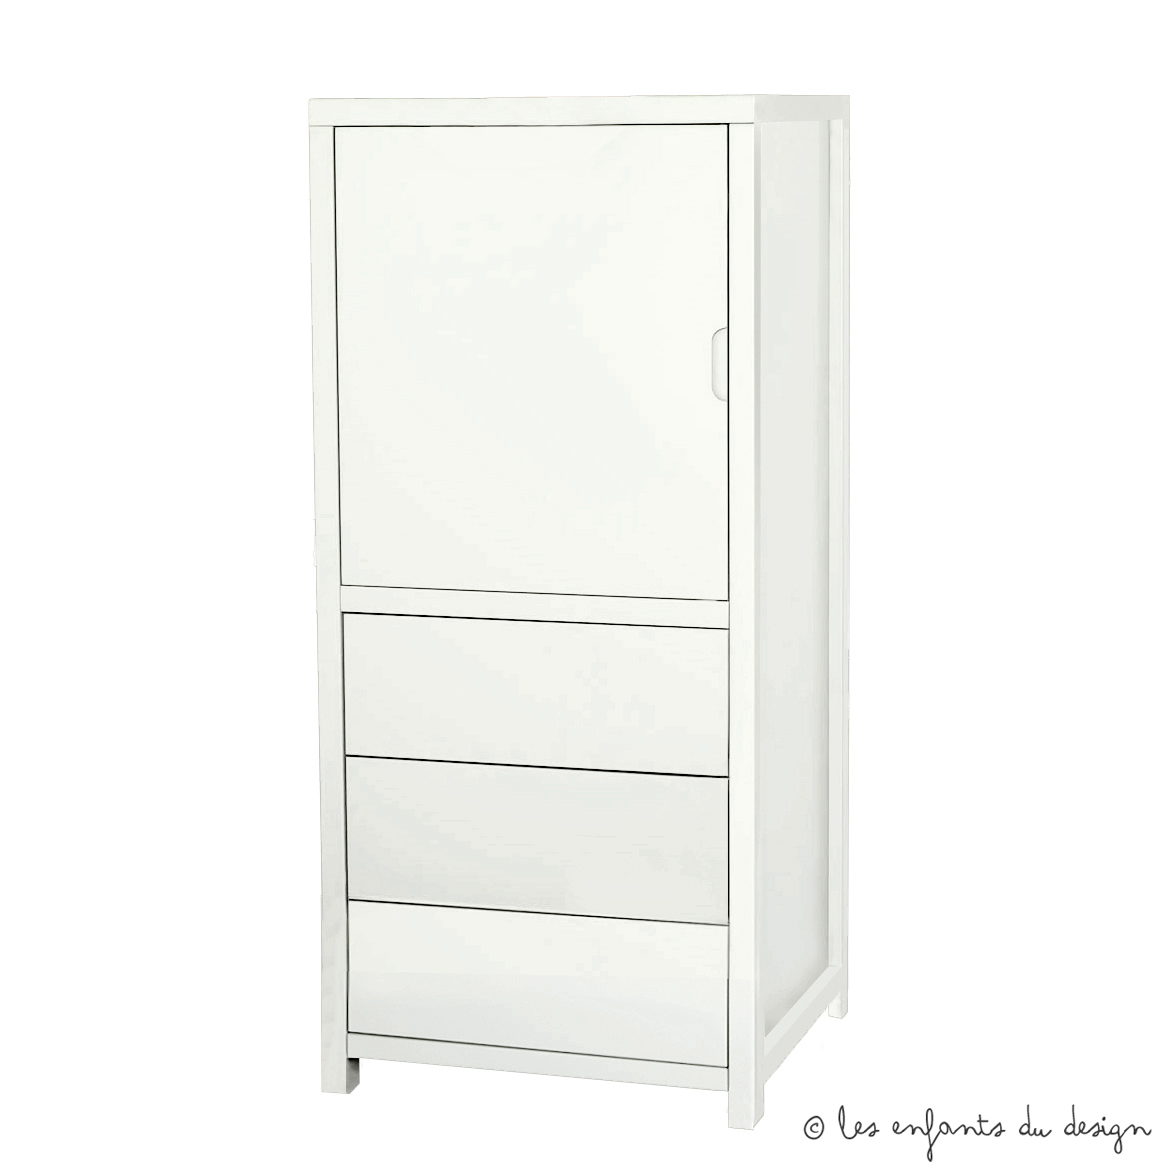 Armoire joy small blanc quax pour chambre enfant les for Armoire pour chambre enfant